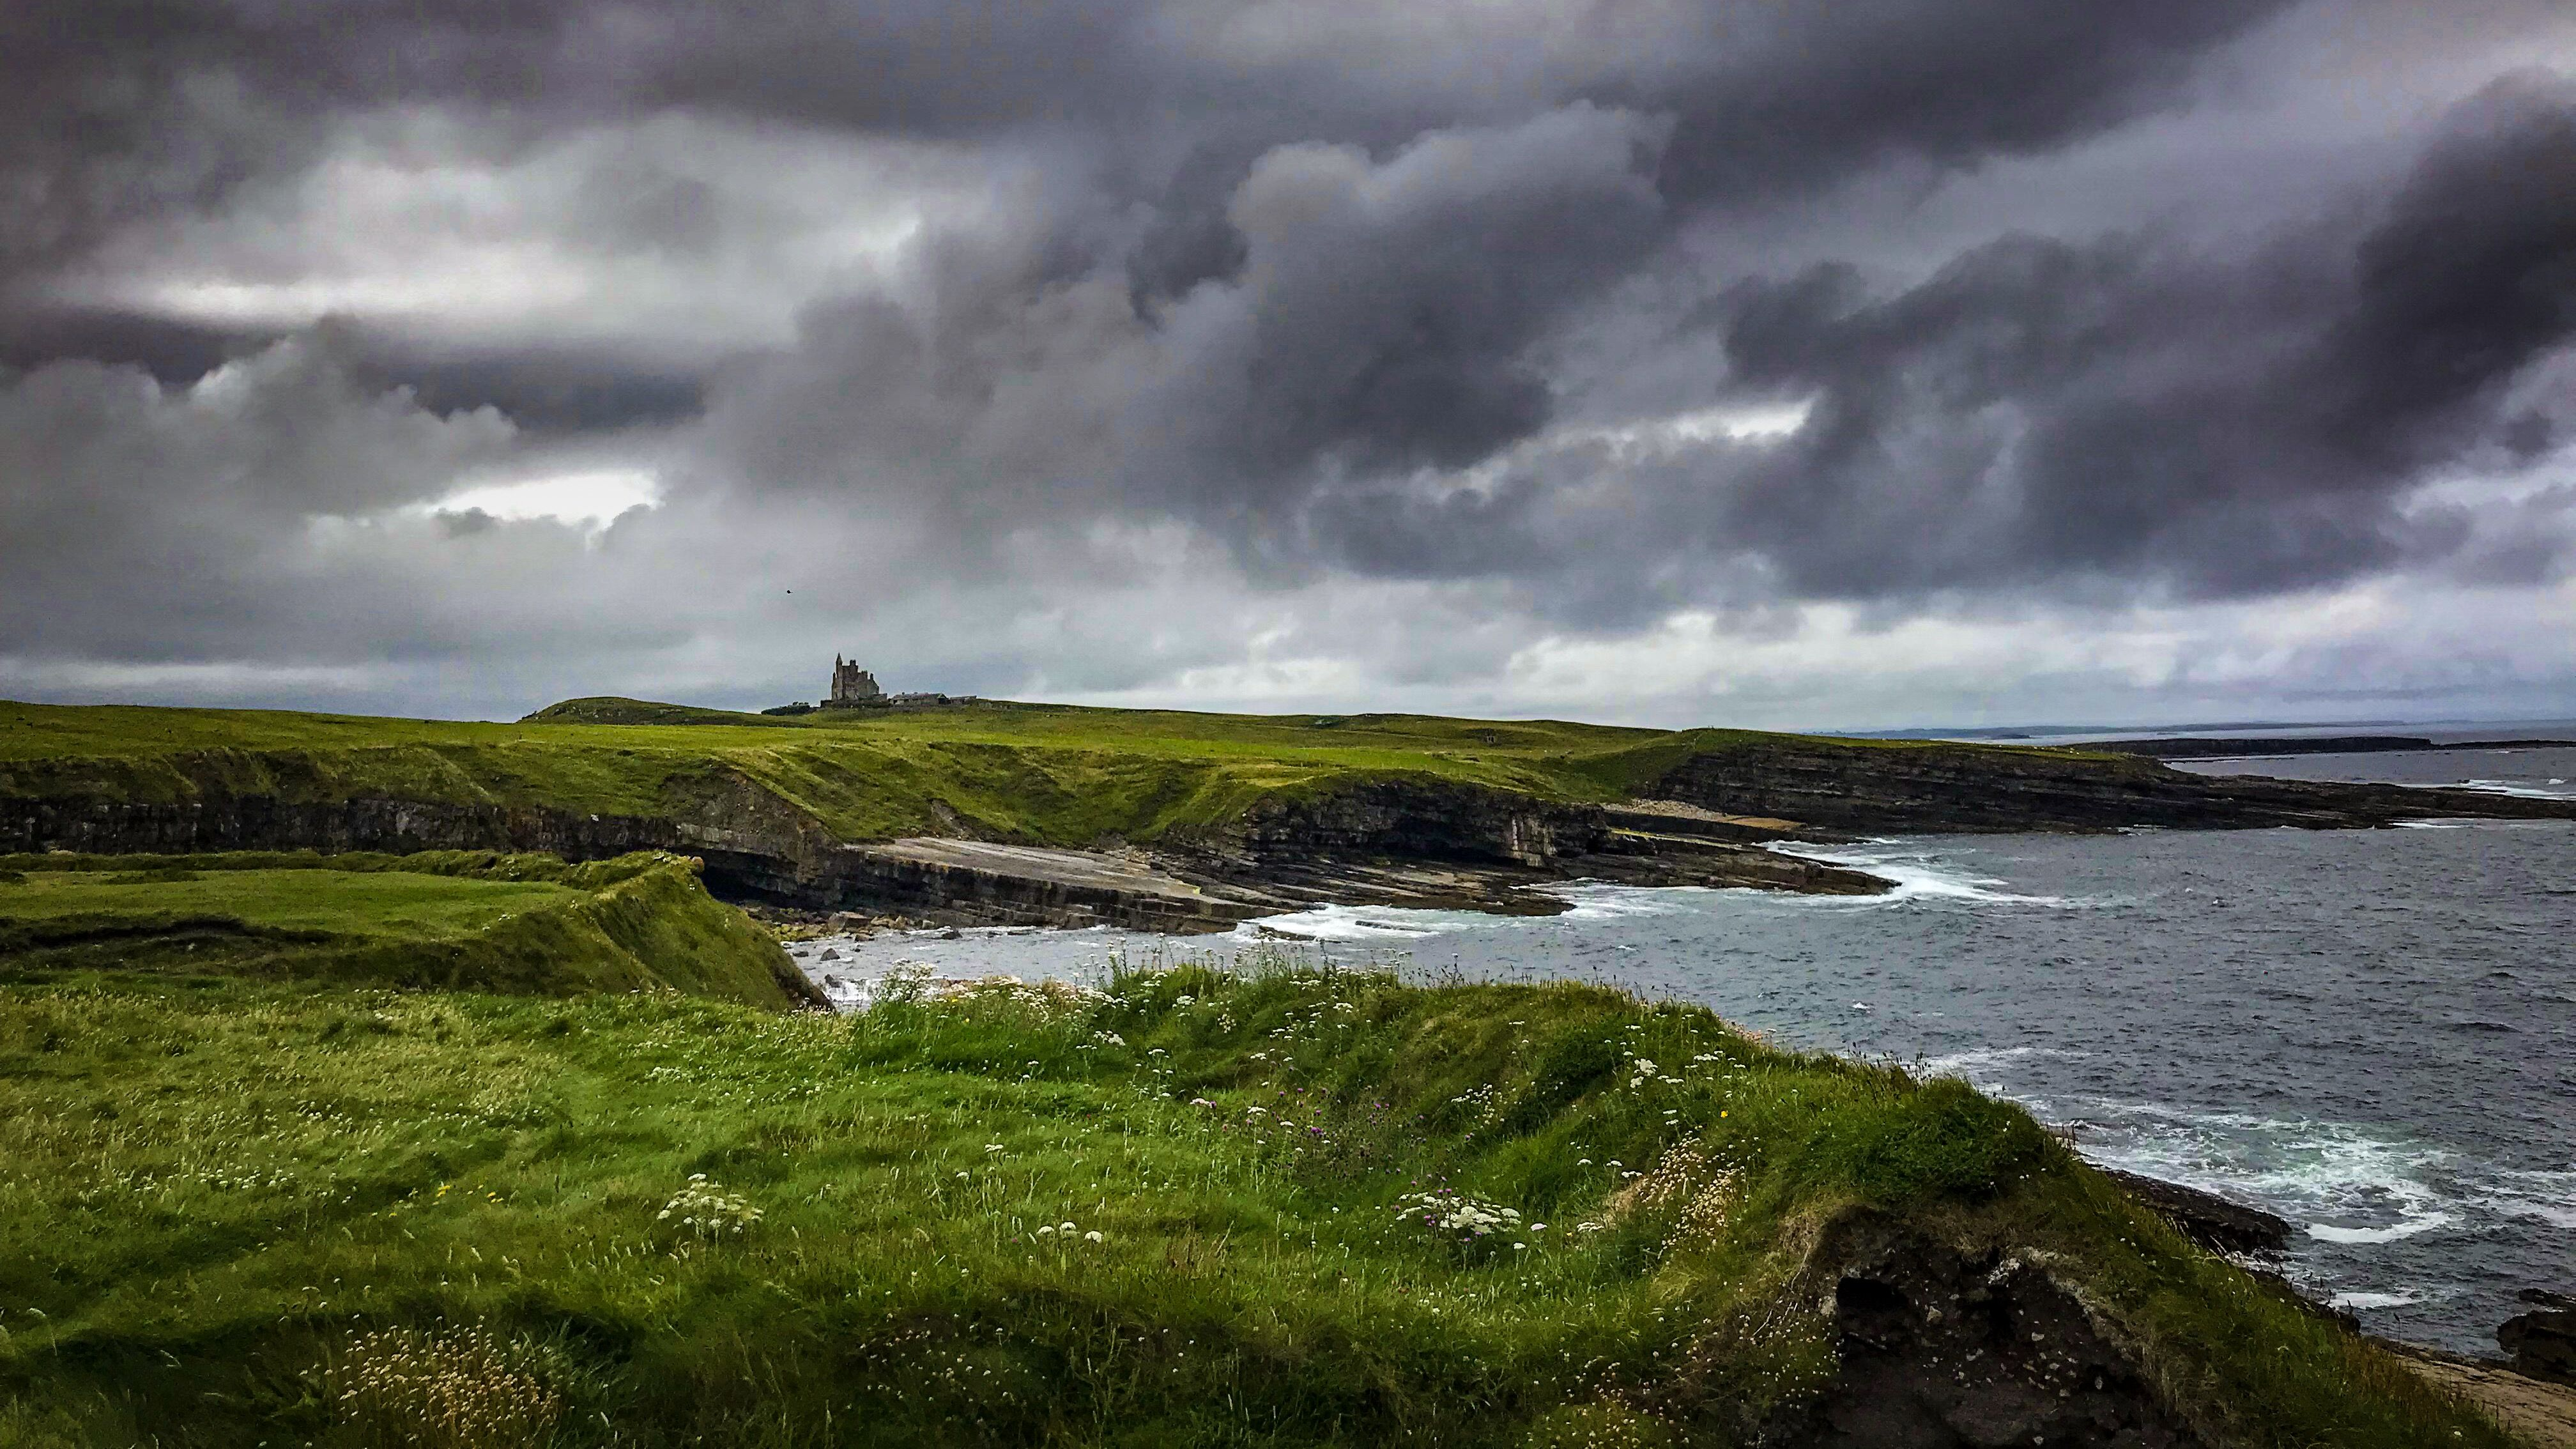 County sligo coastline